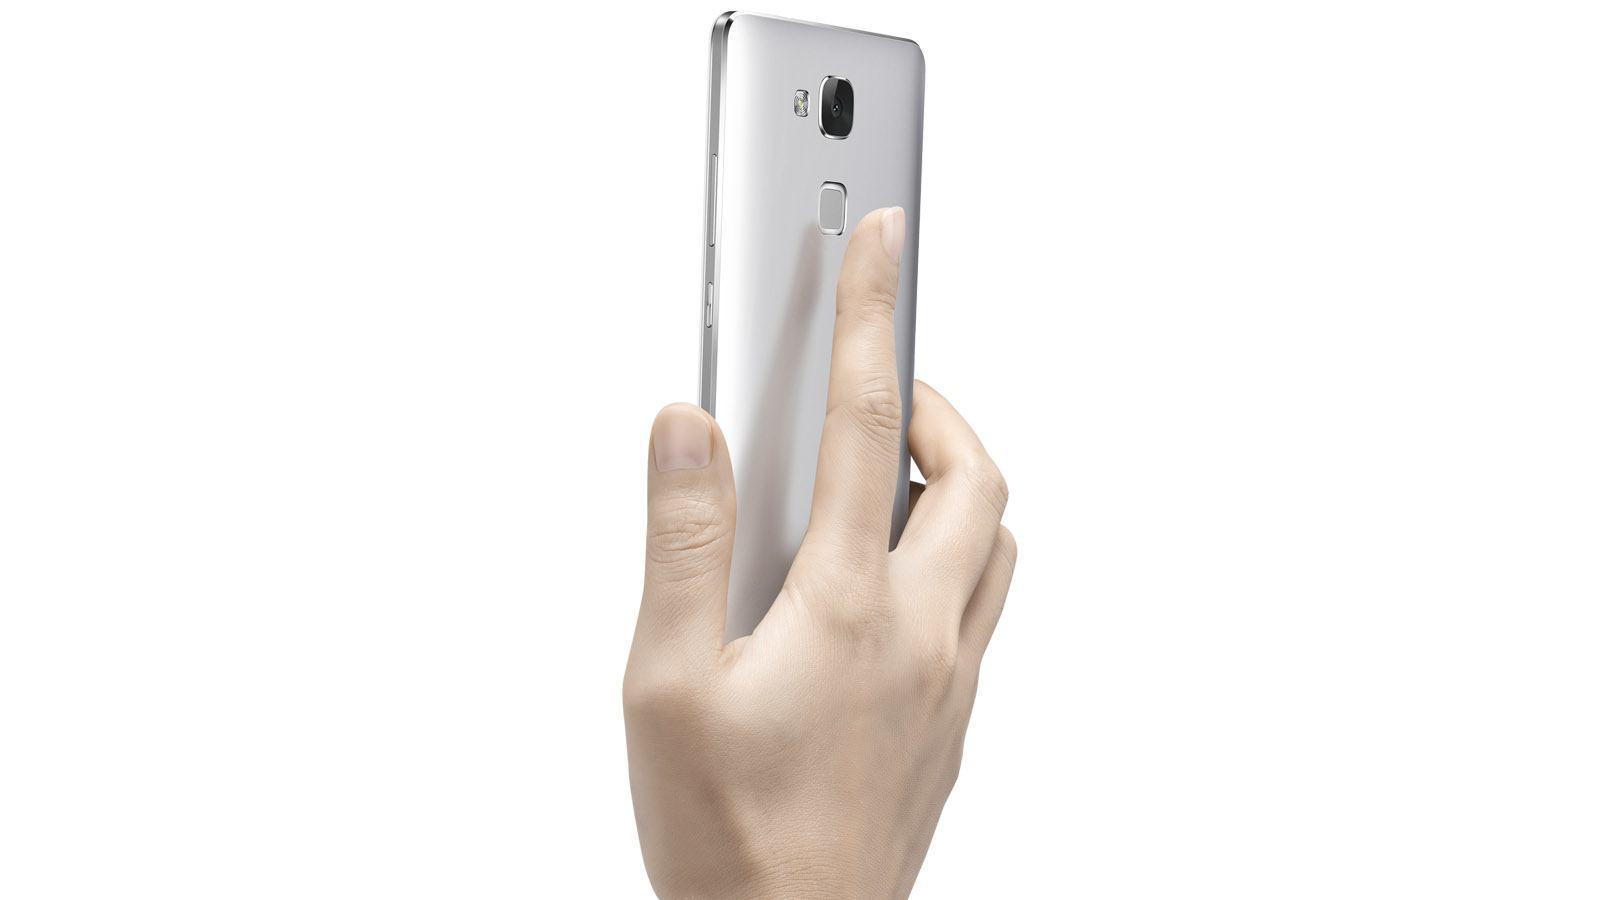 Huawei Ascend Mate 7 Fingerprint reader